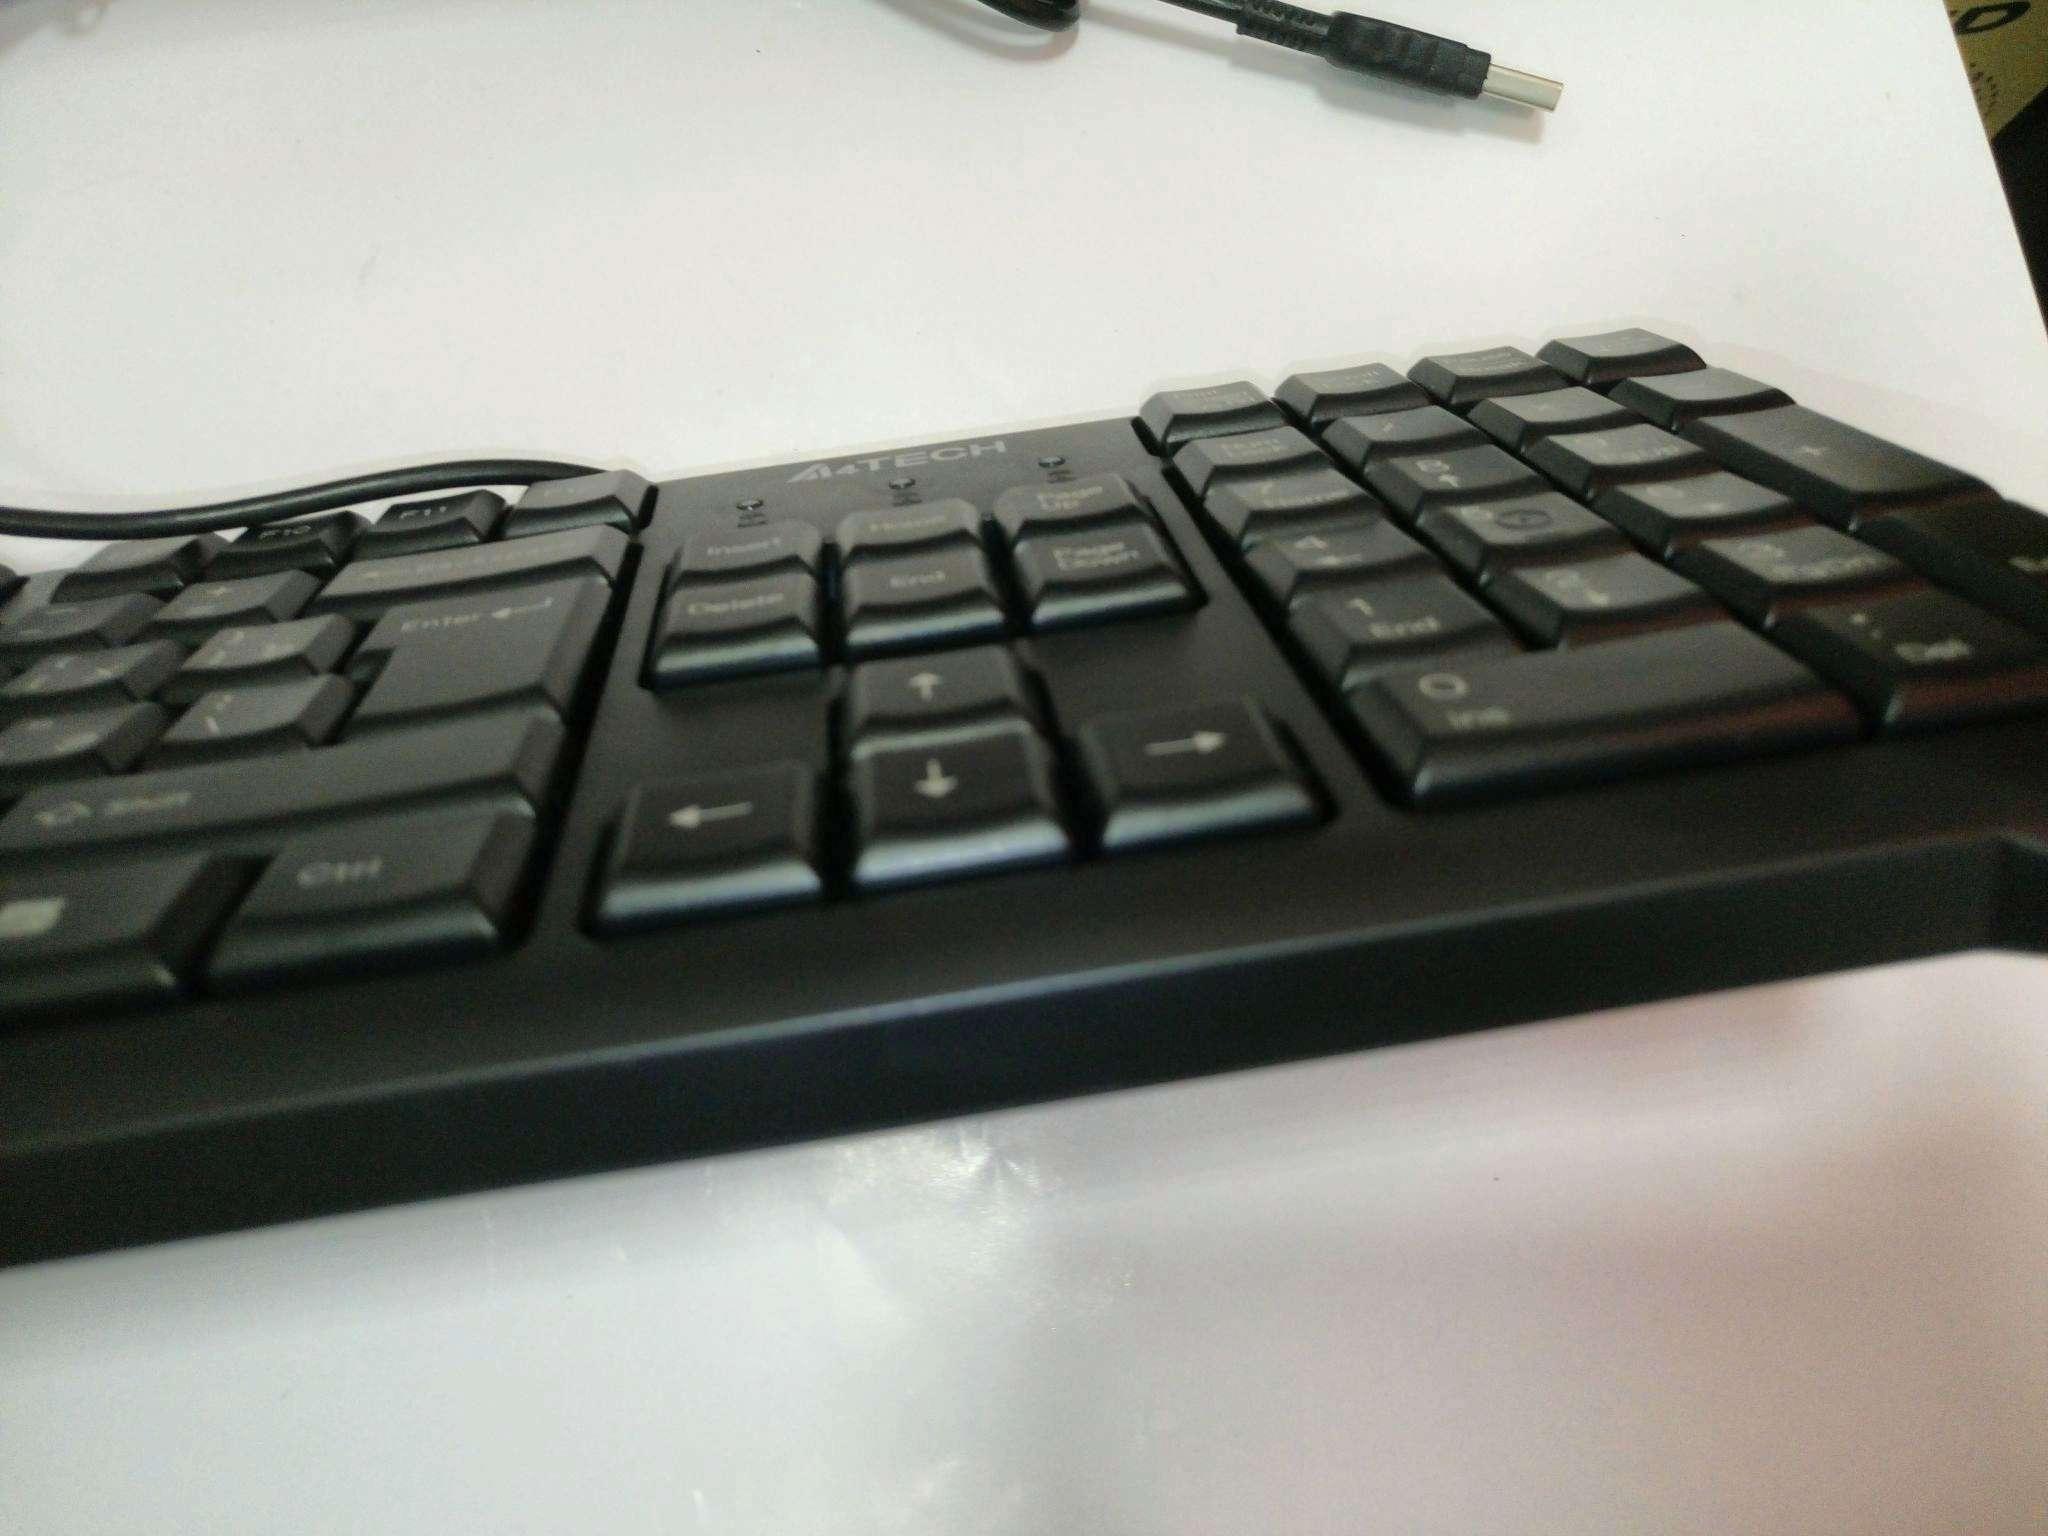 <b>Клавиатура</b> A4TECH KR-750 USB Black — купить в интернет ...